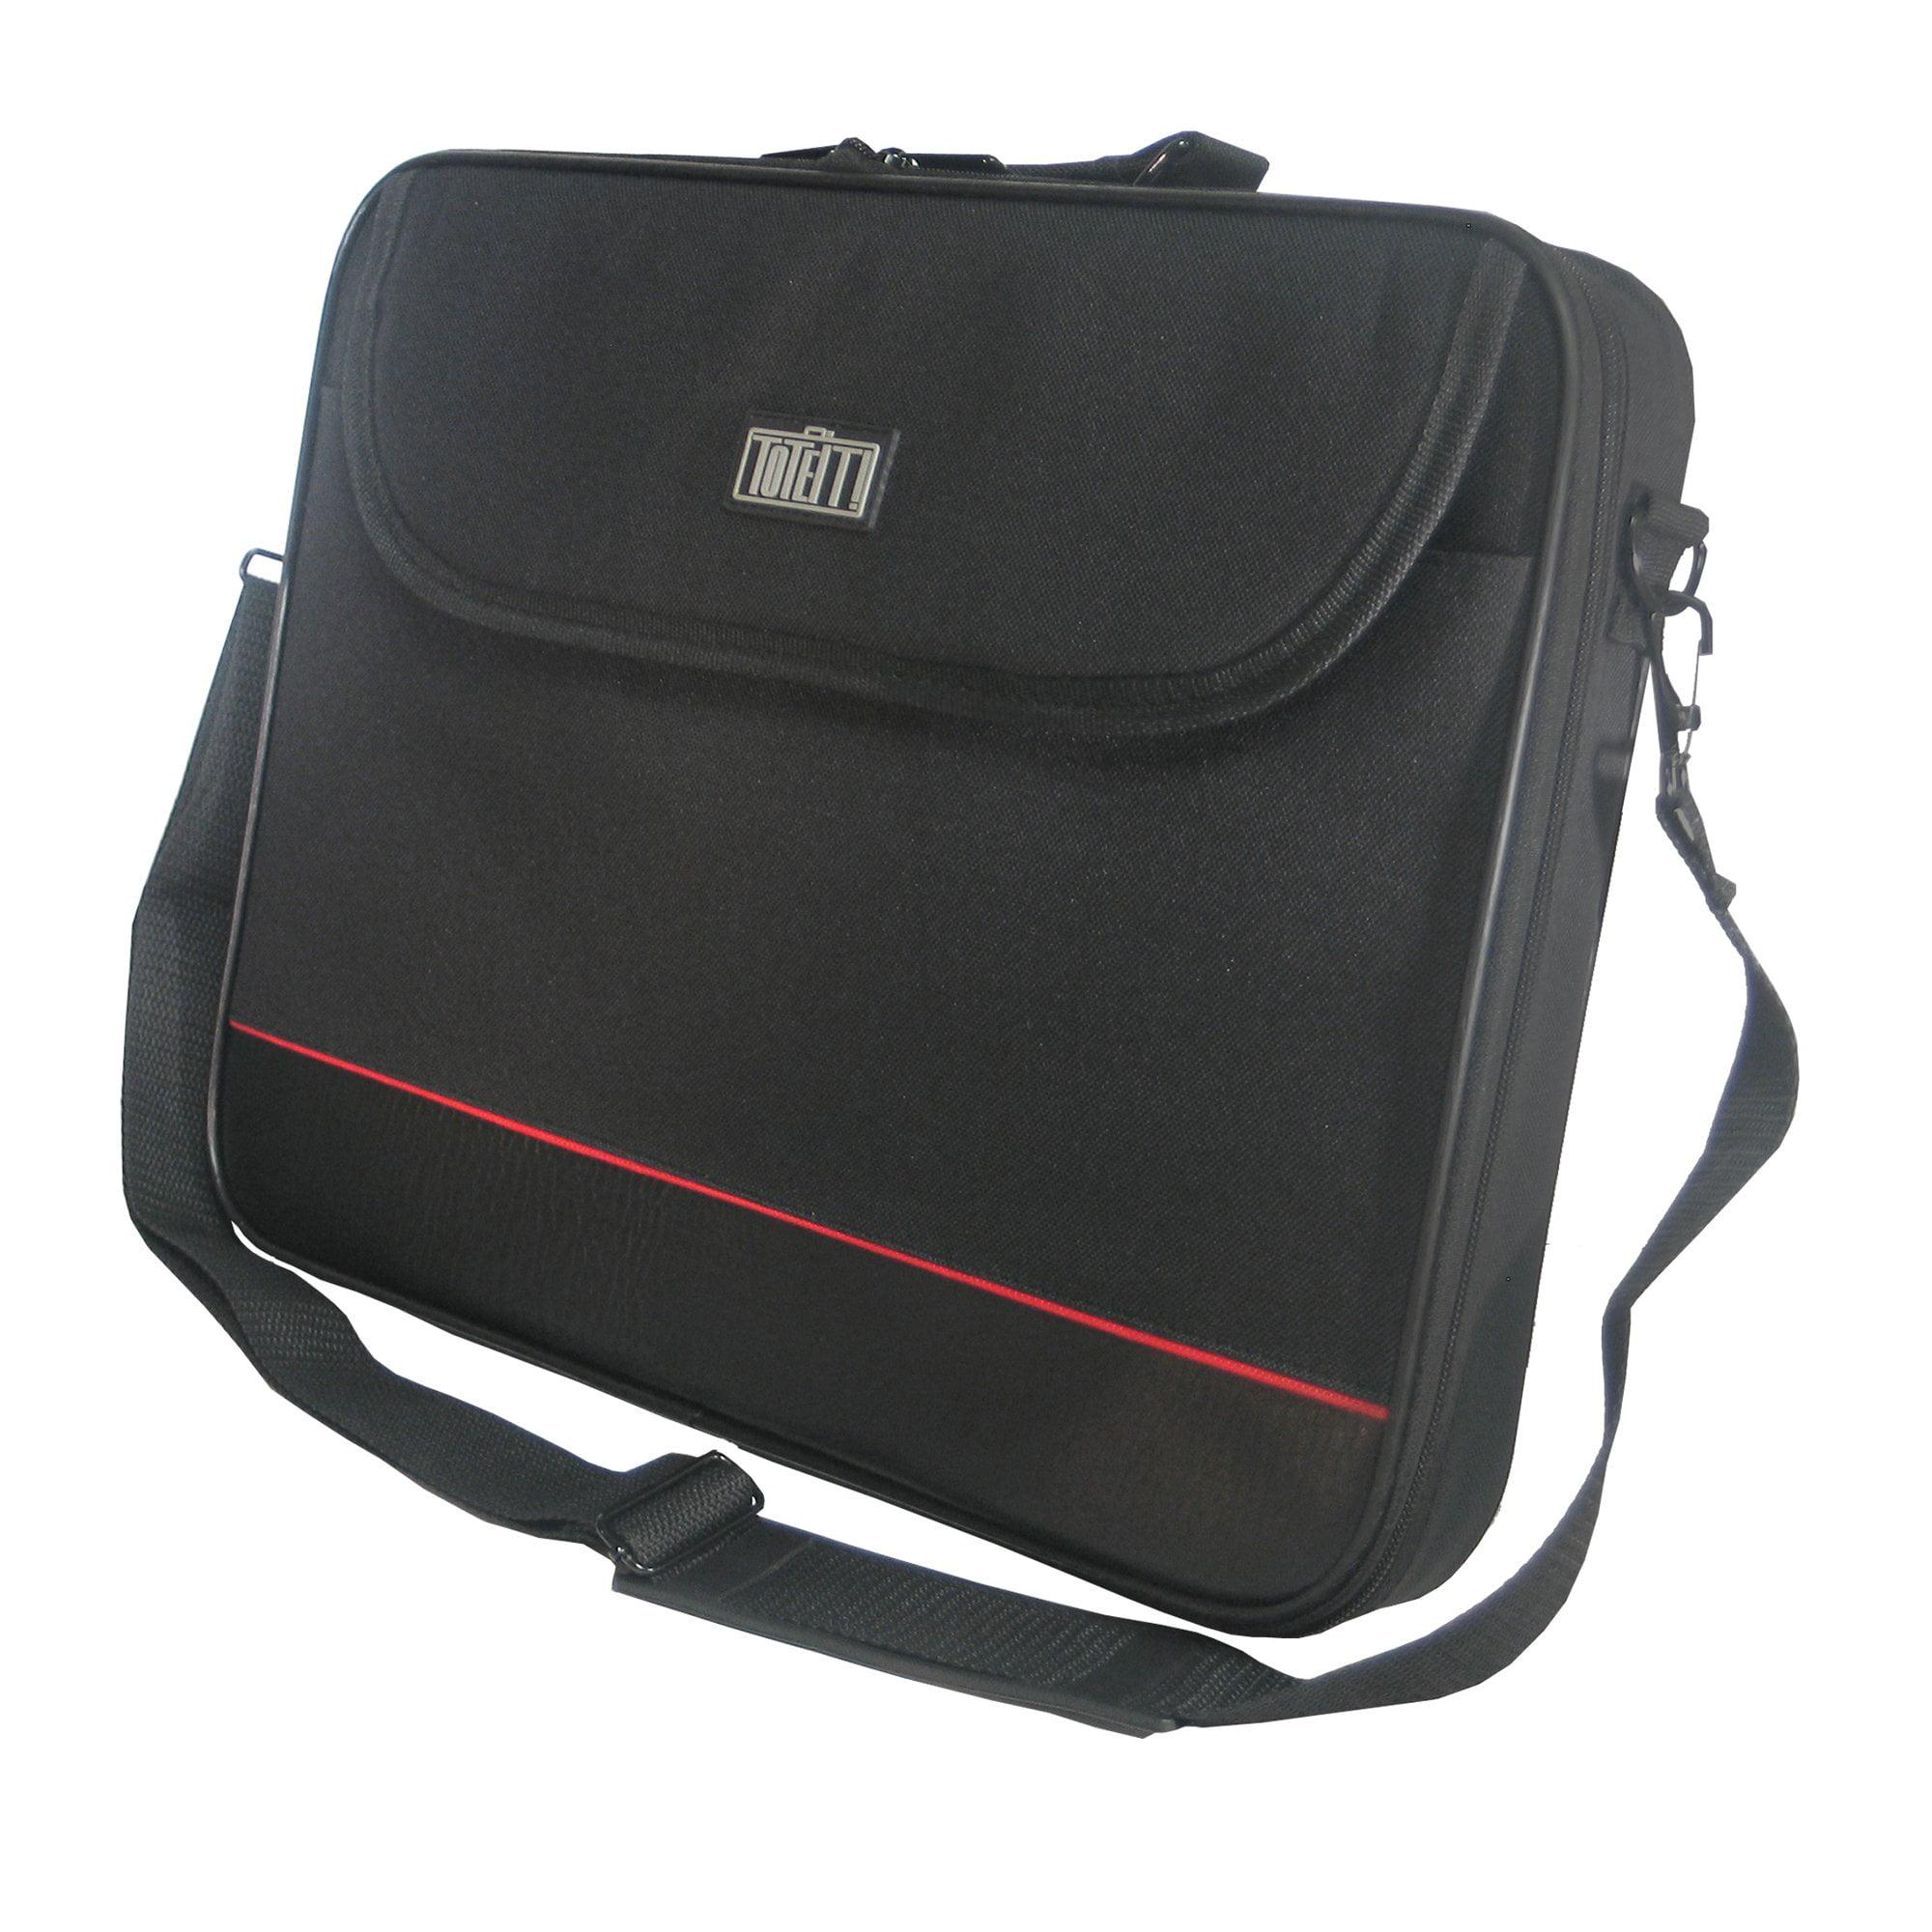 "PC Treasure 07932 ToteIt 15.6"" Laptop Bag, Black"